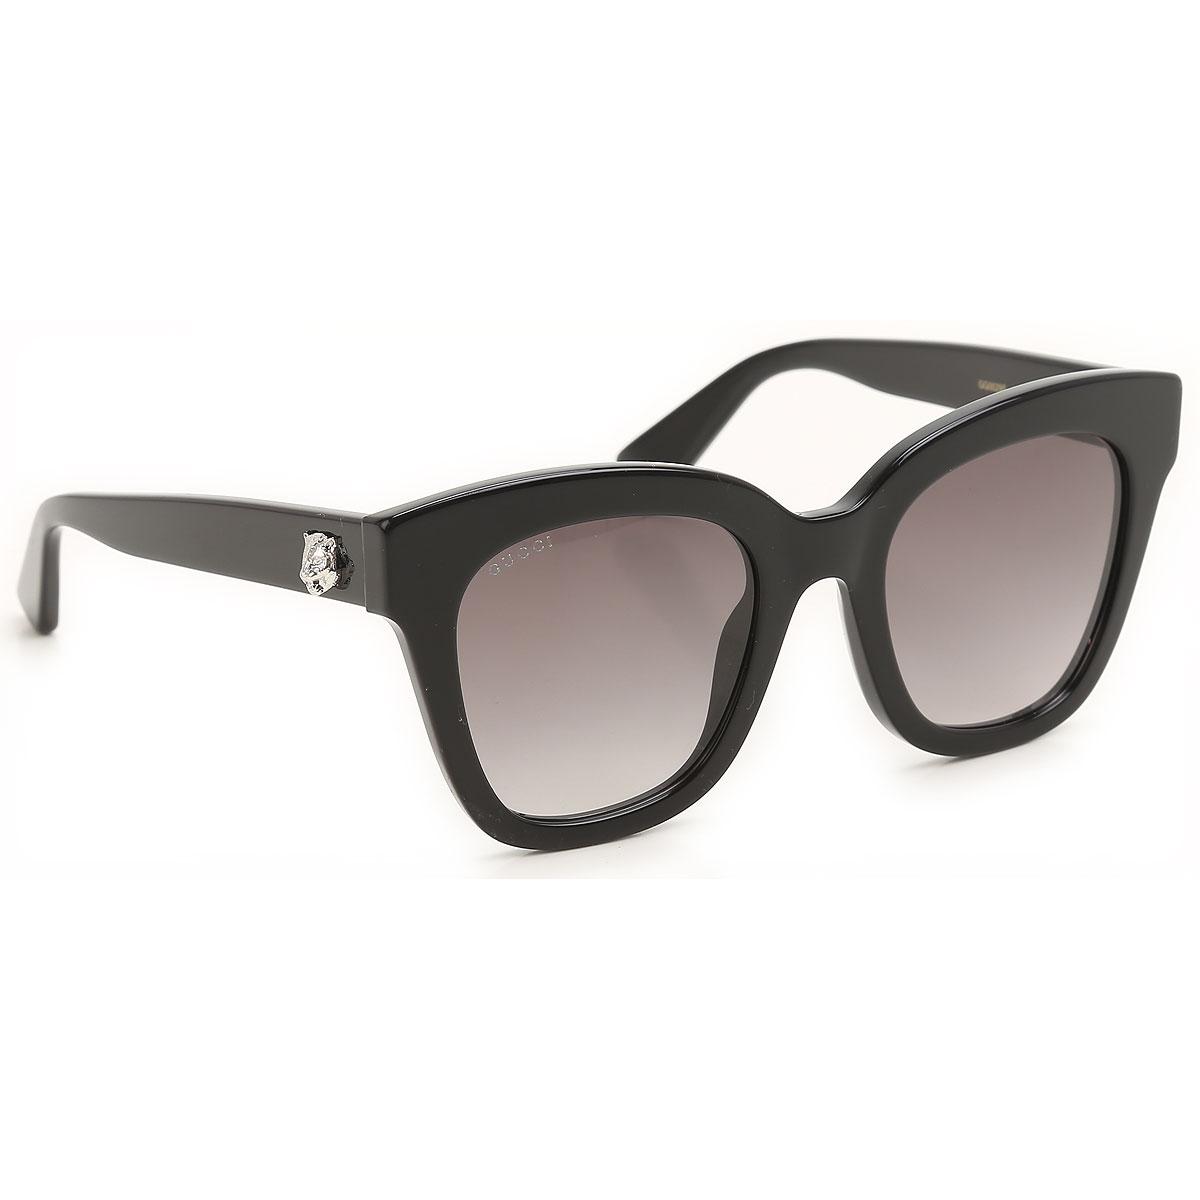 Gafas y Lentes de Sol Gucci, Detalle Modelo: gg0029s-001-